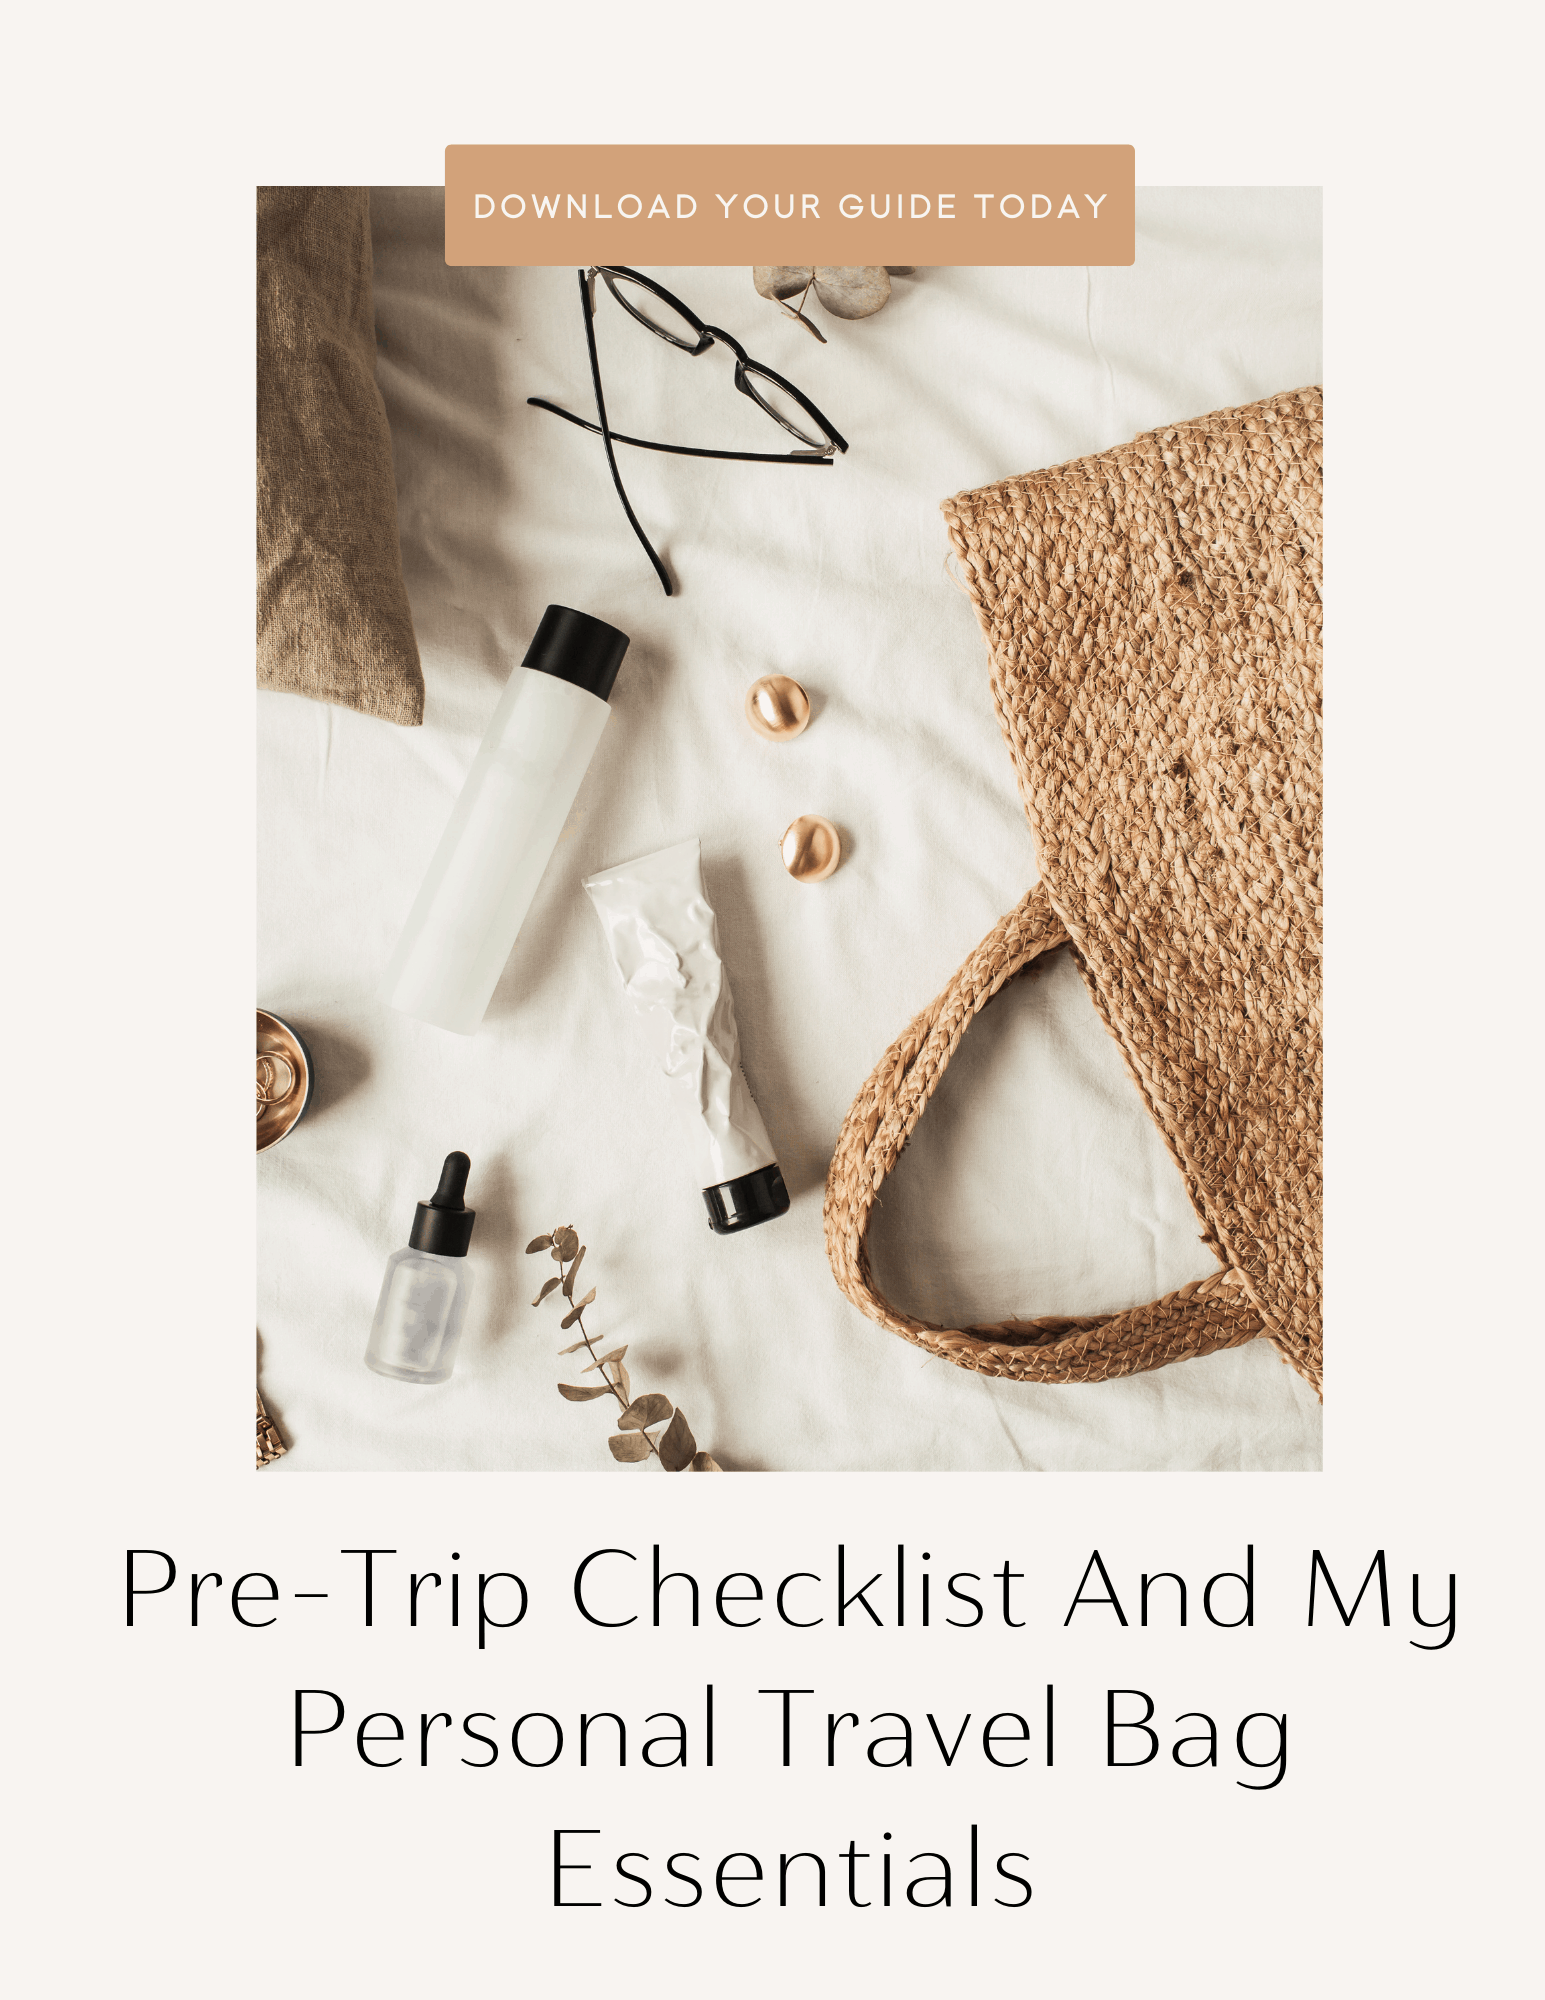 international travel check list, personal travel bag checklist